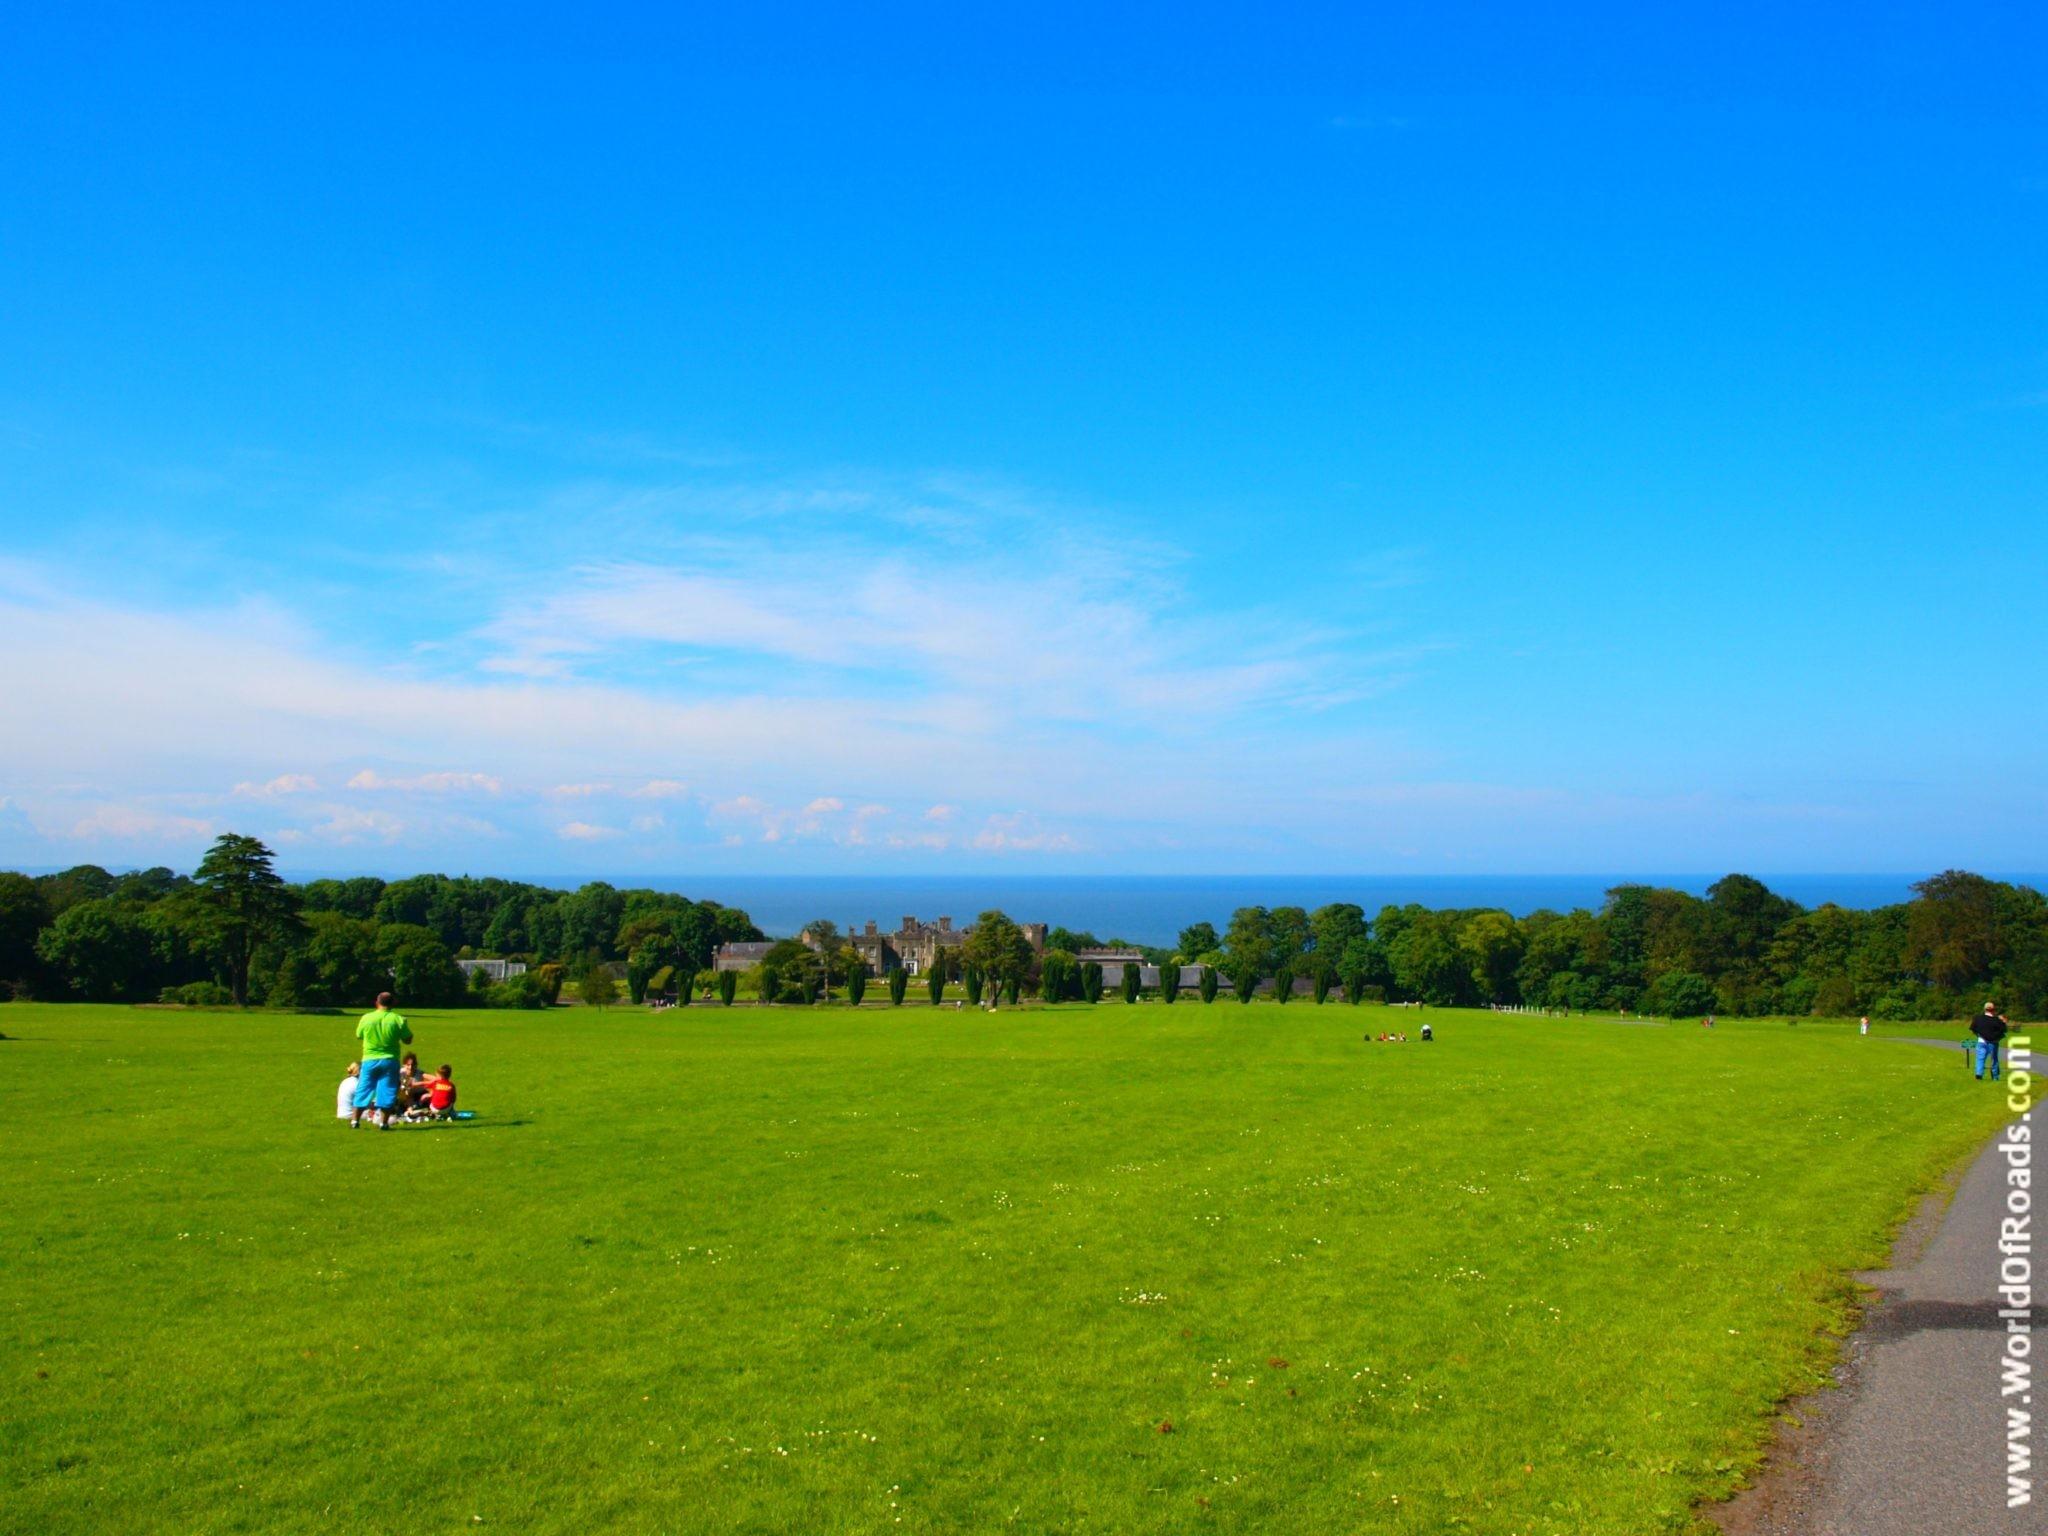 Замок Ардгиллан (Ardgillan Castle). Лужайки. Ирландия.